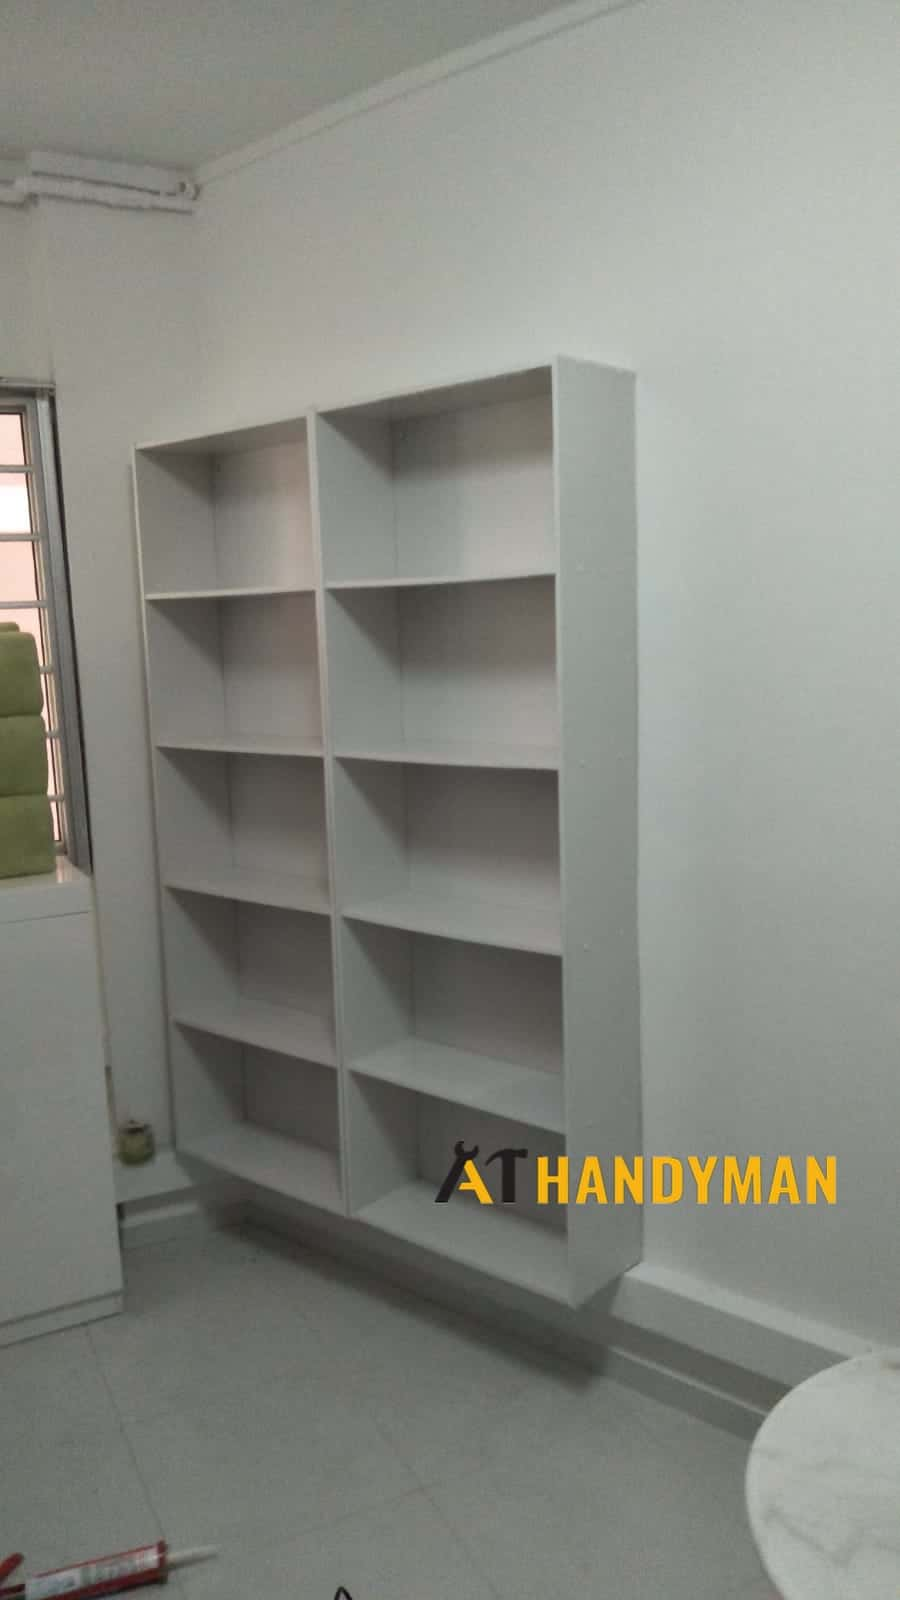 shelf-furniture-assembly-wall-mounting-service-drilling-services-a1-handyman-singapore-hdb-bishan2